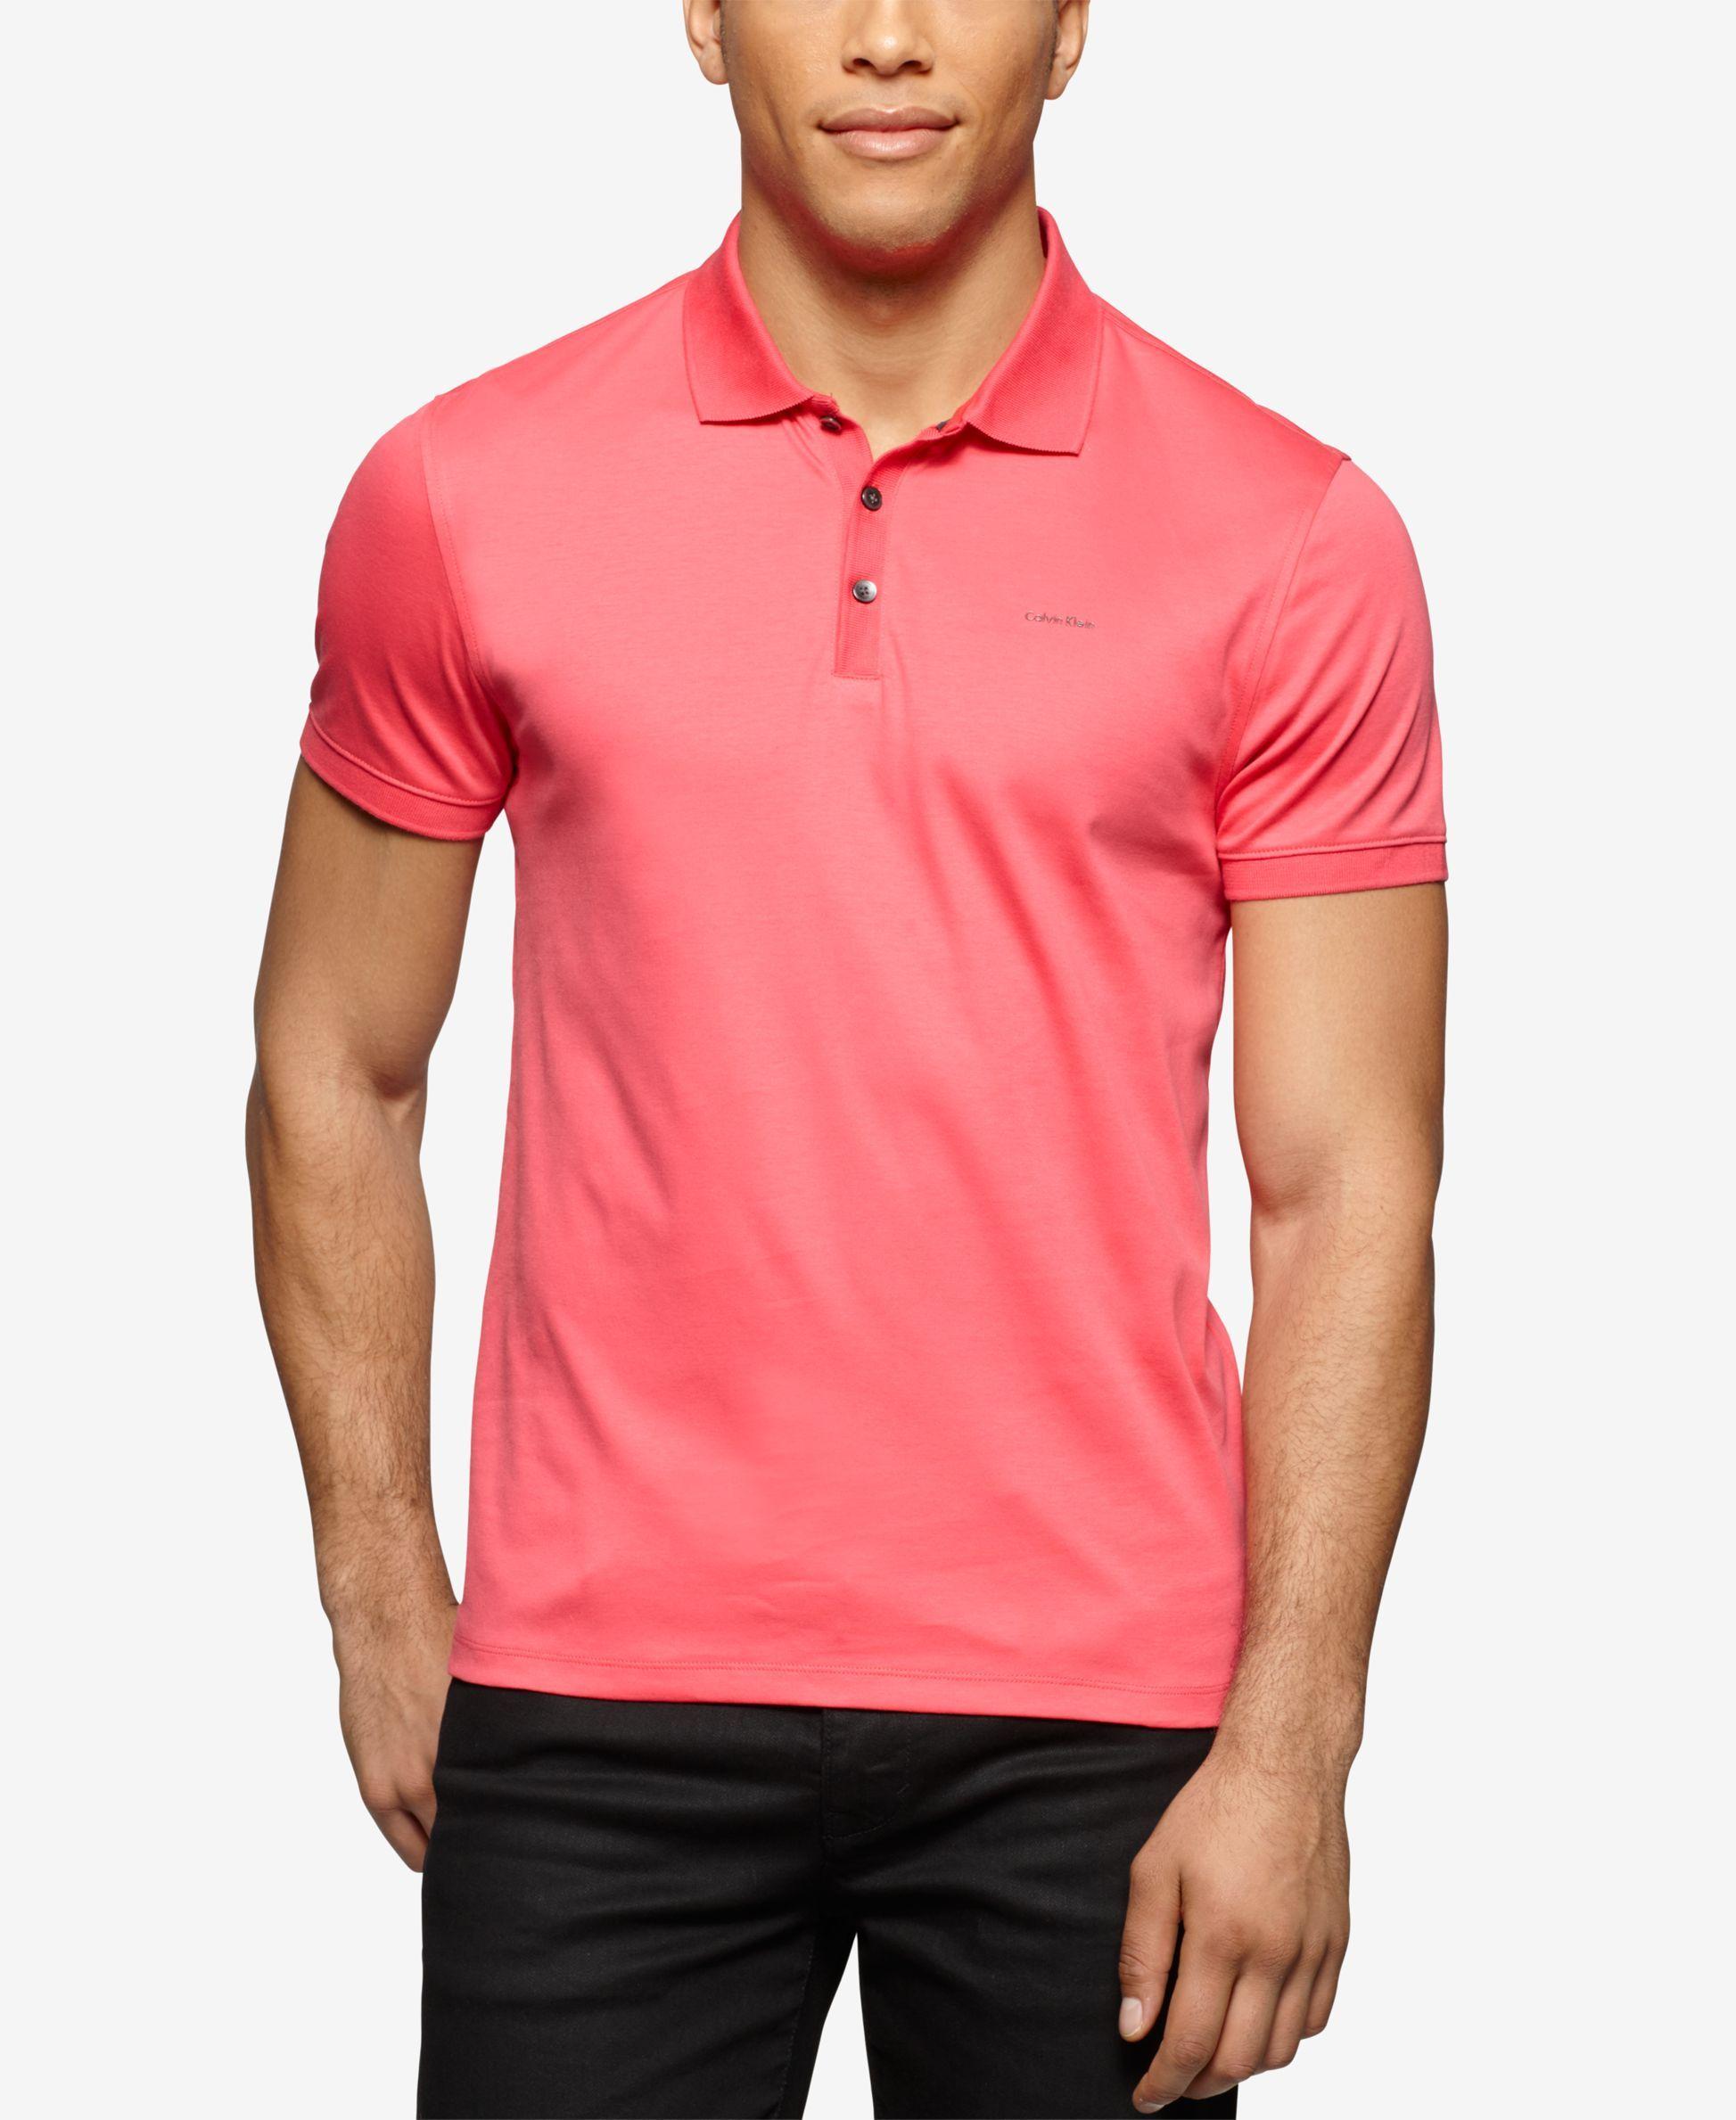 Calvin Klein Solid Jersey Interlock Liquid Cotton Polo